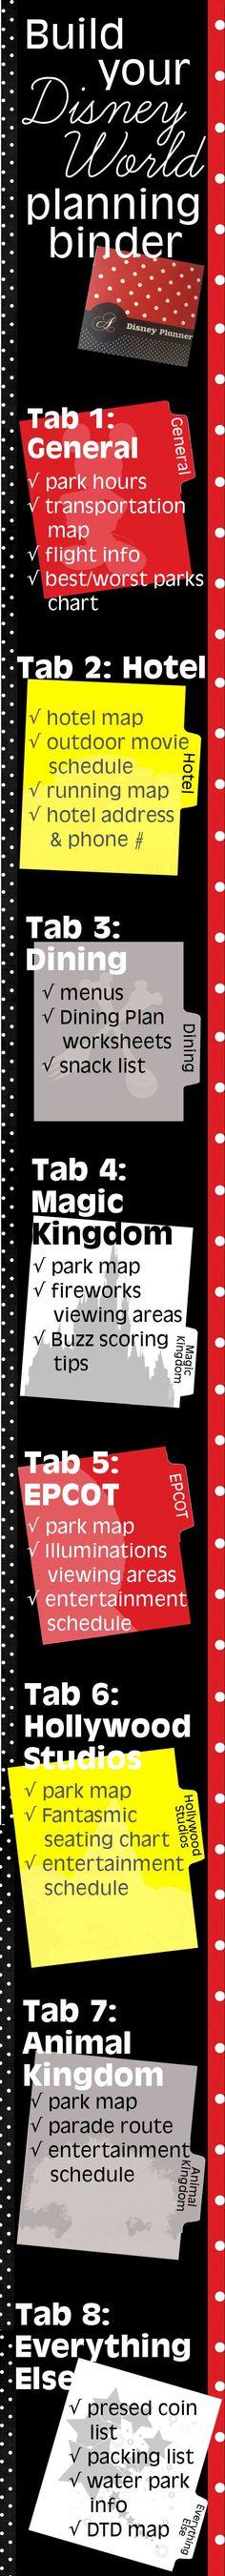 Build your Disney planning binder